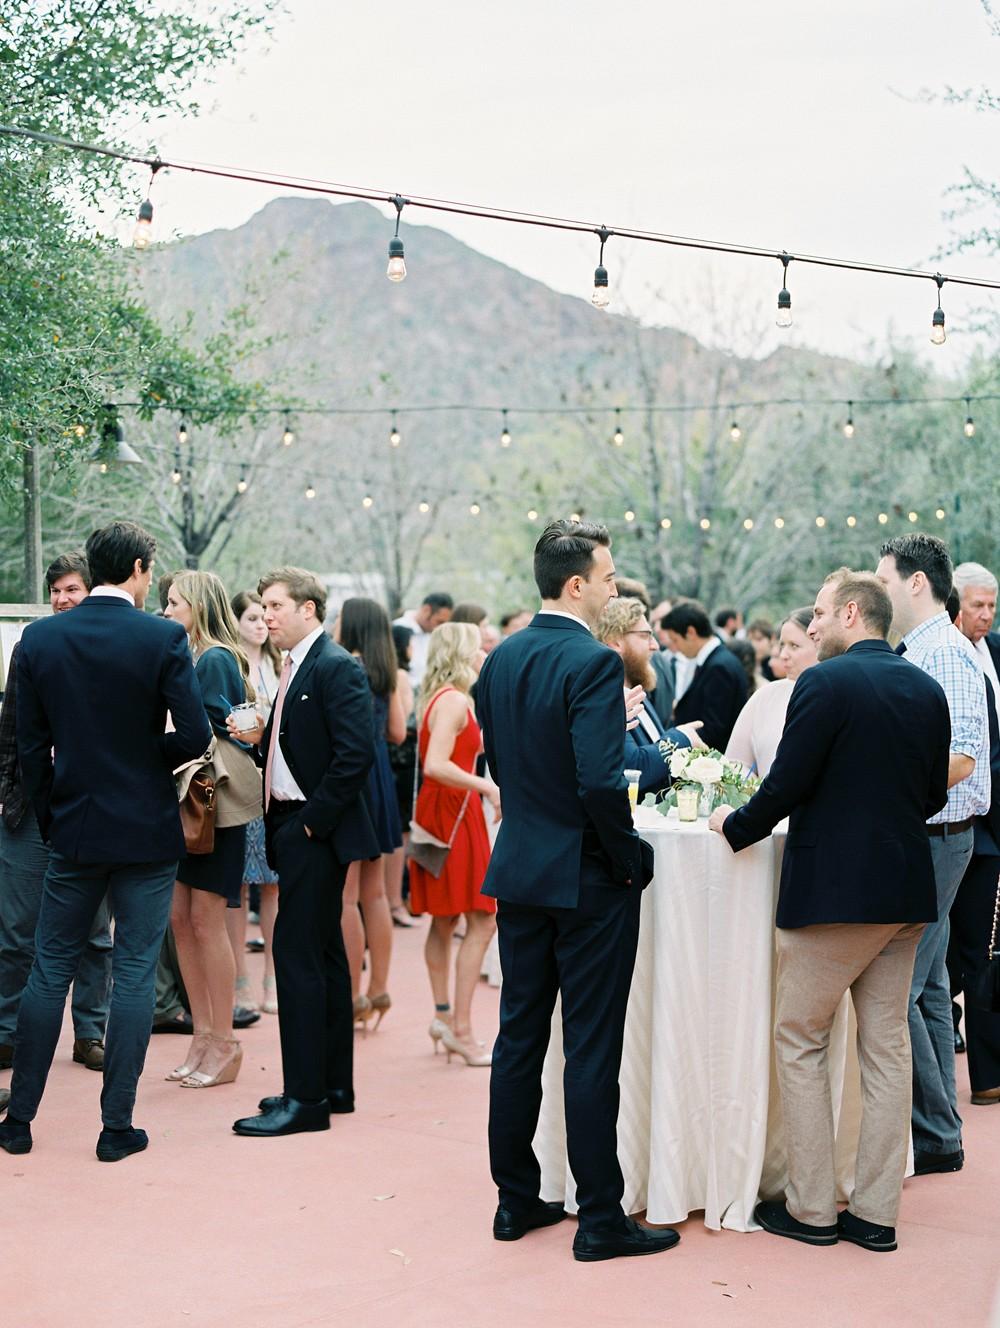 Marian and Mark's Blush and Coral Arizona Wedding